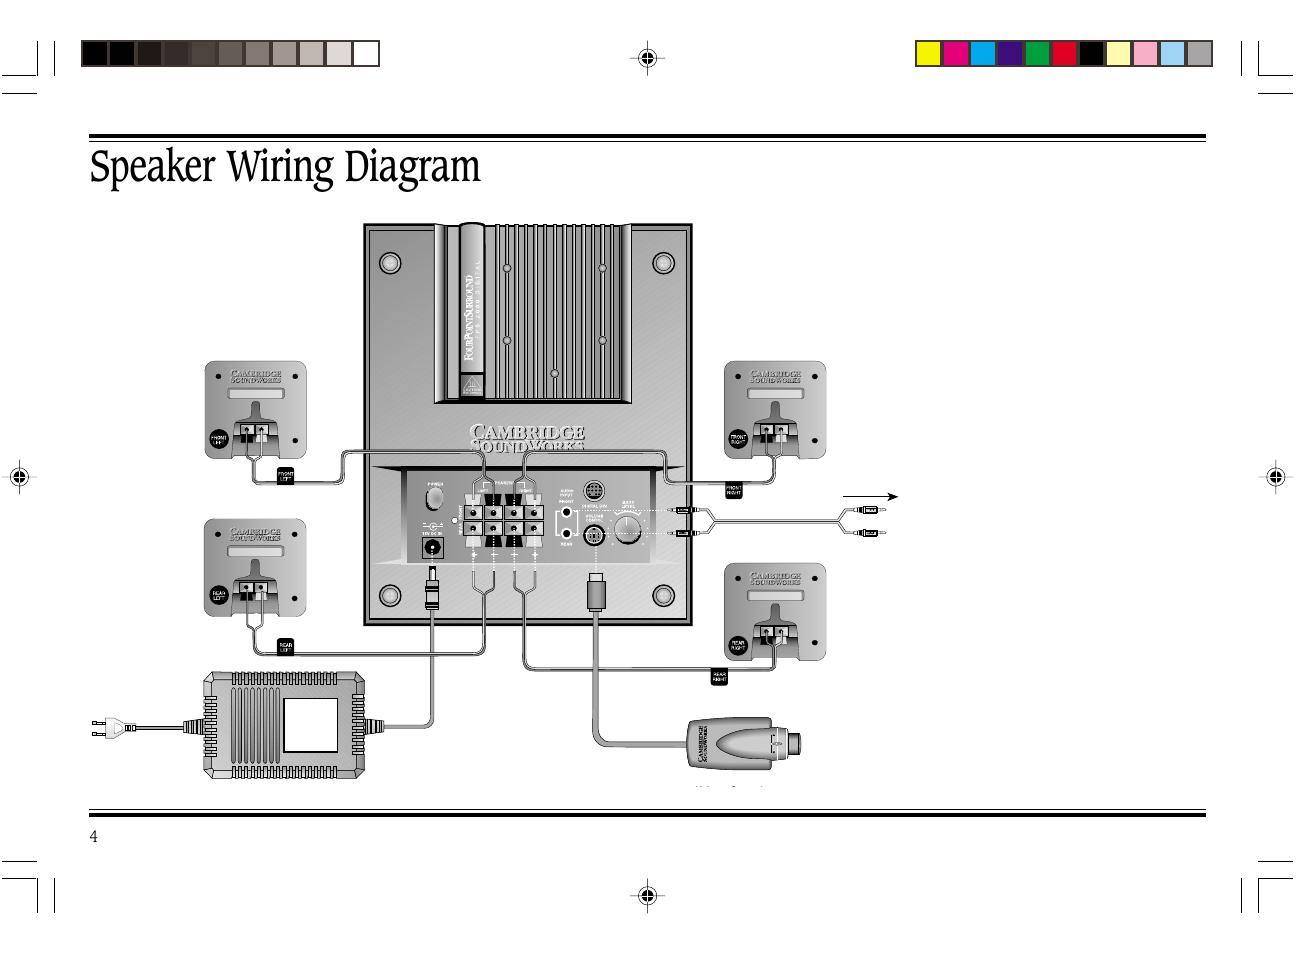 netgear wiring diagram